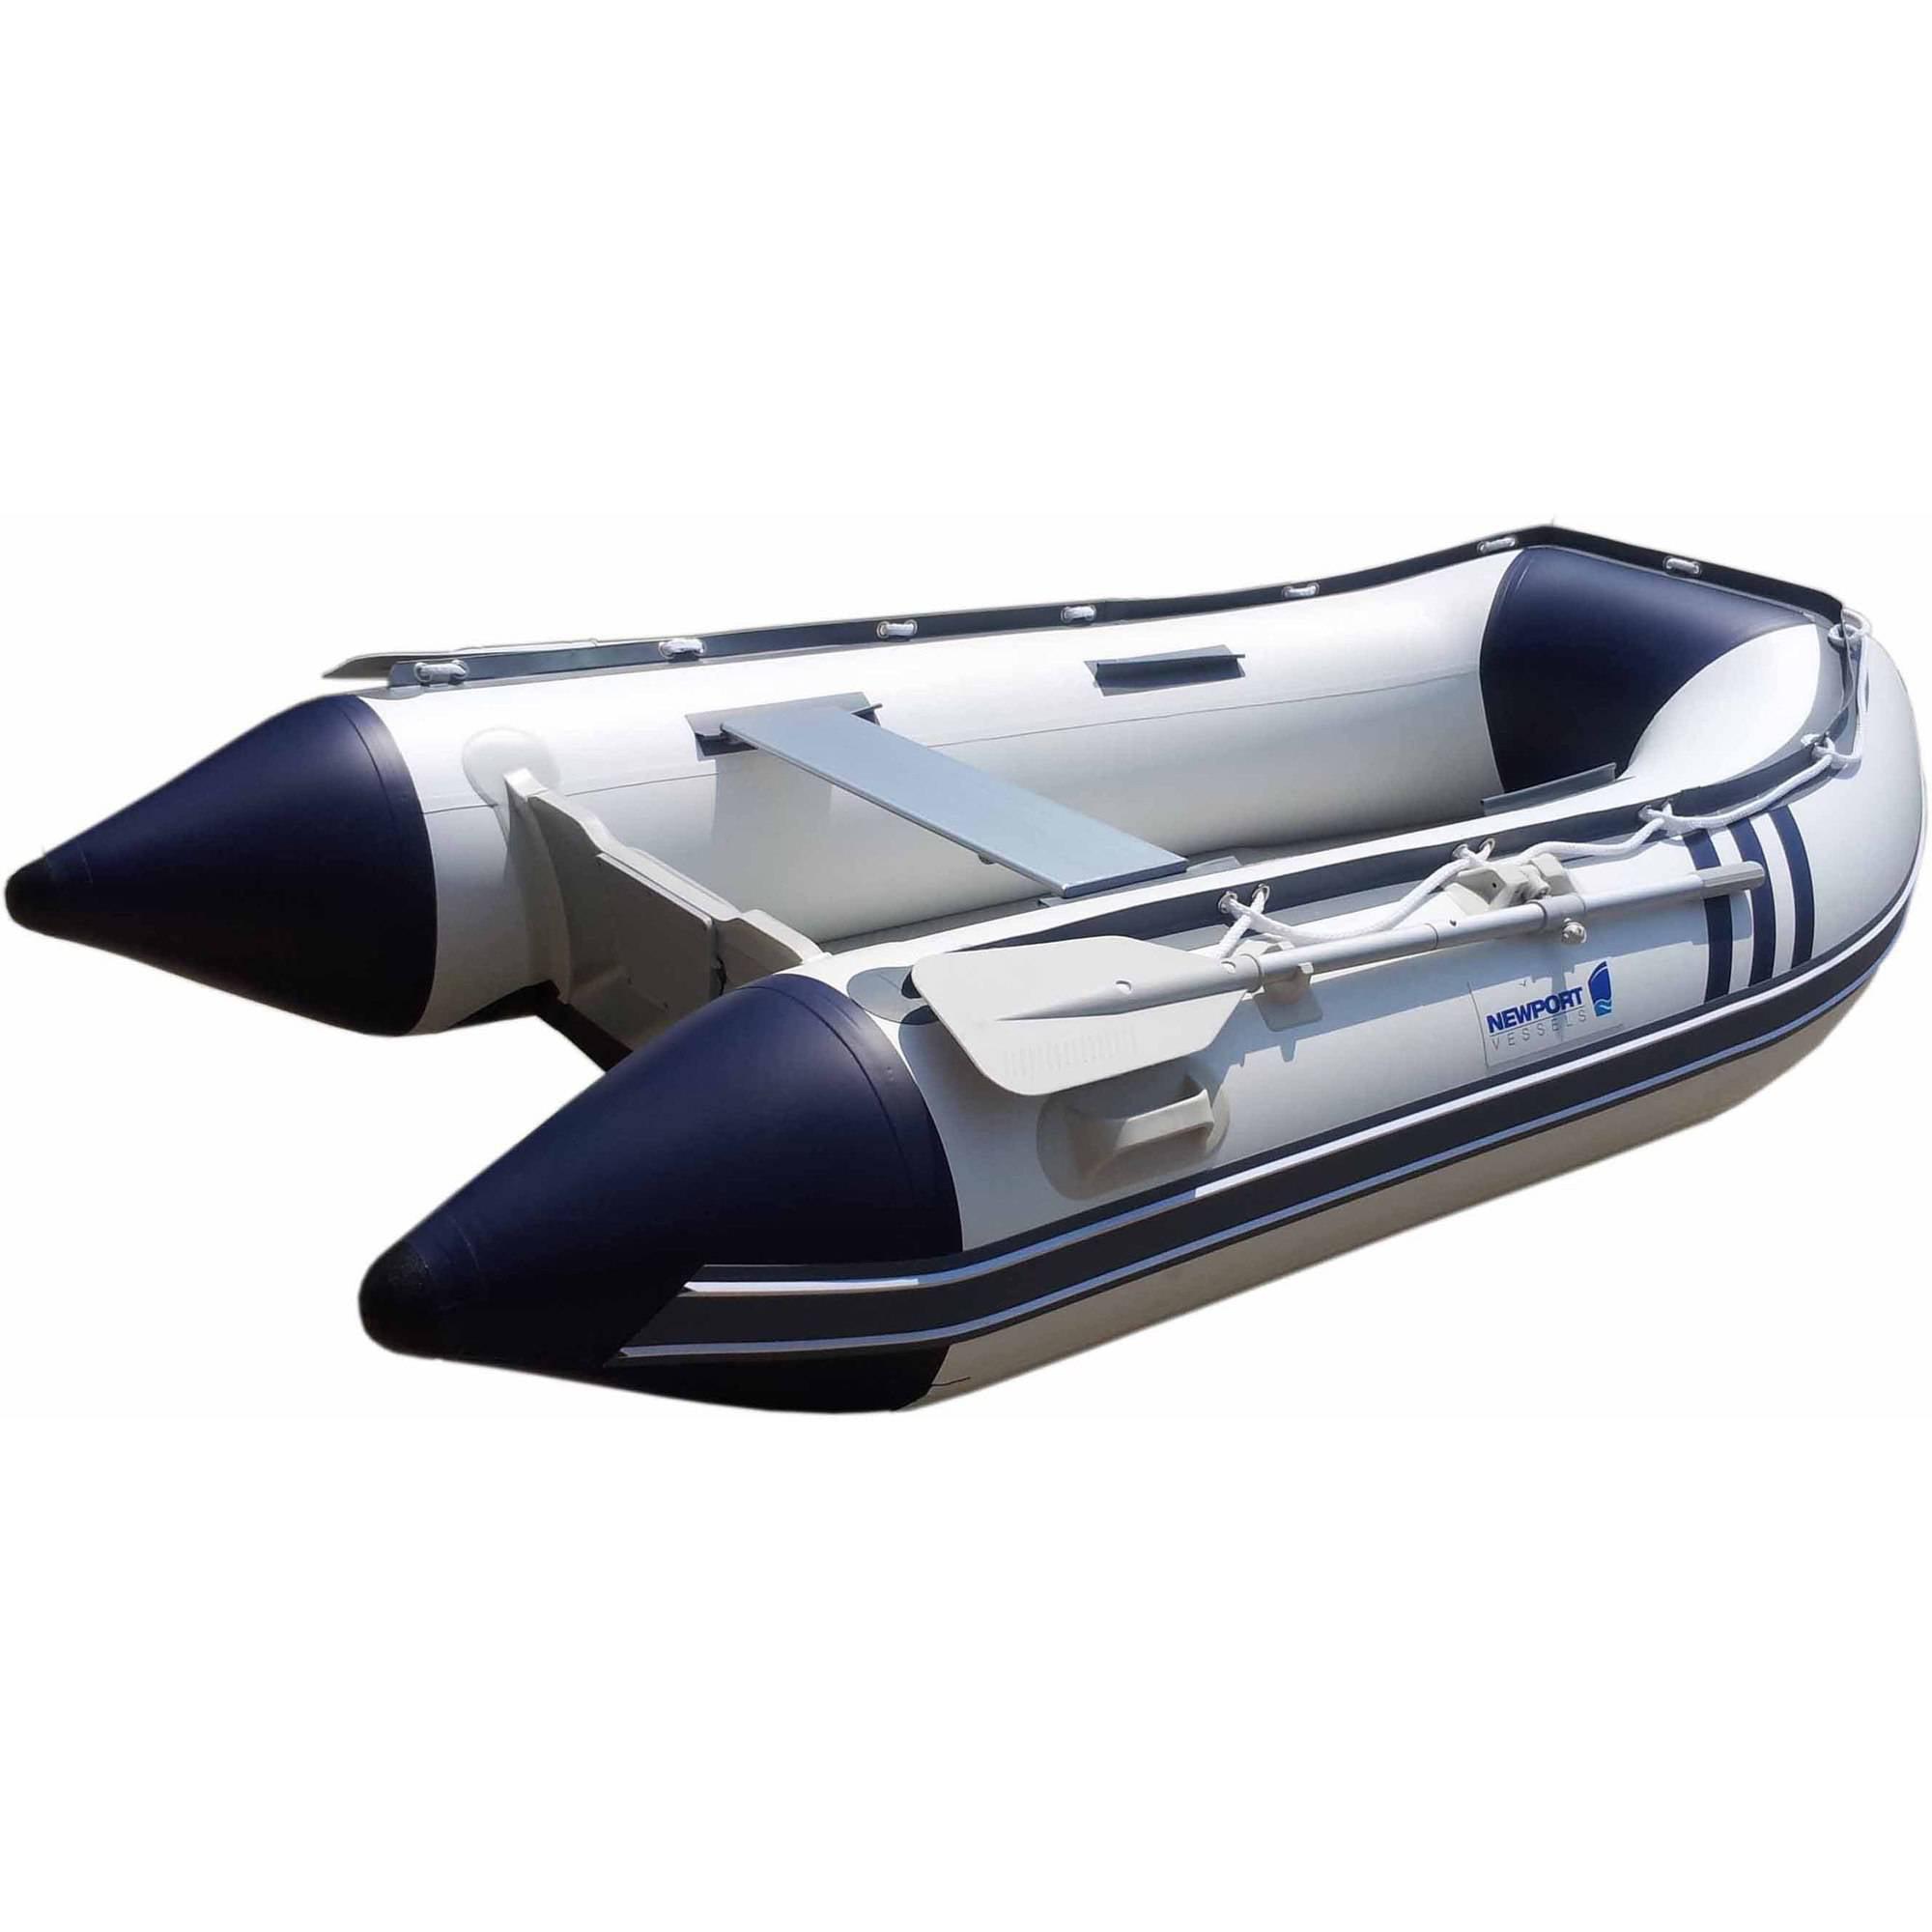 Newport Vessels 9' Seascape Inflatable Sport Tender Dinghy Boat, Air Floor